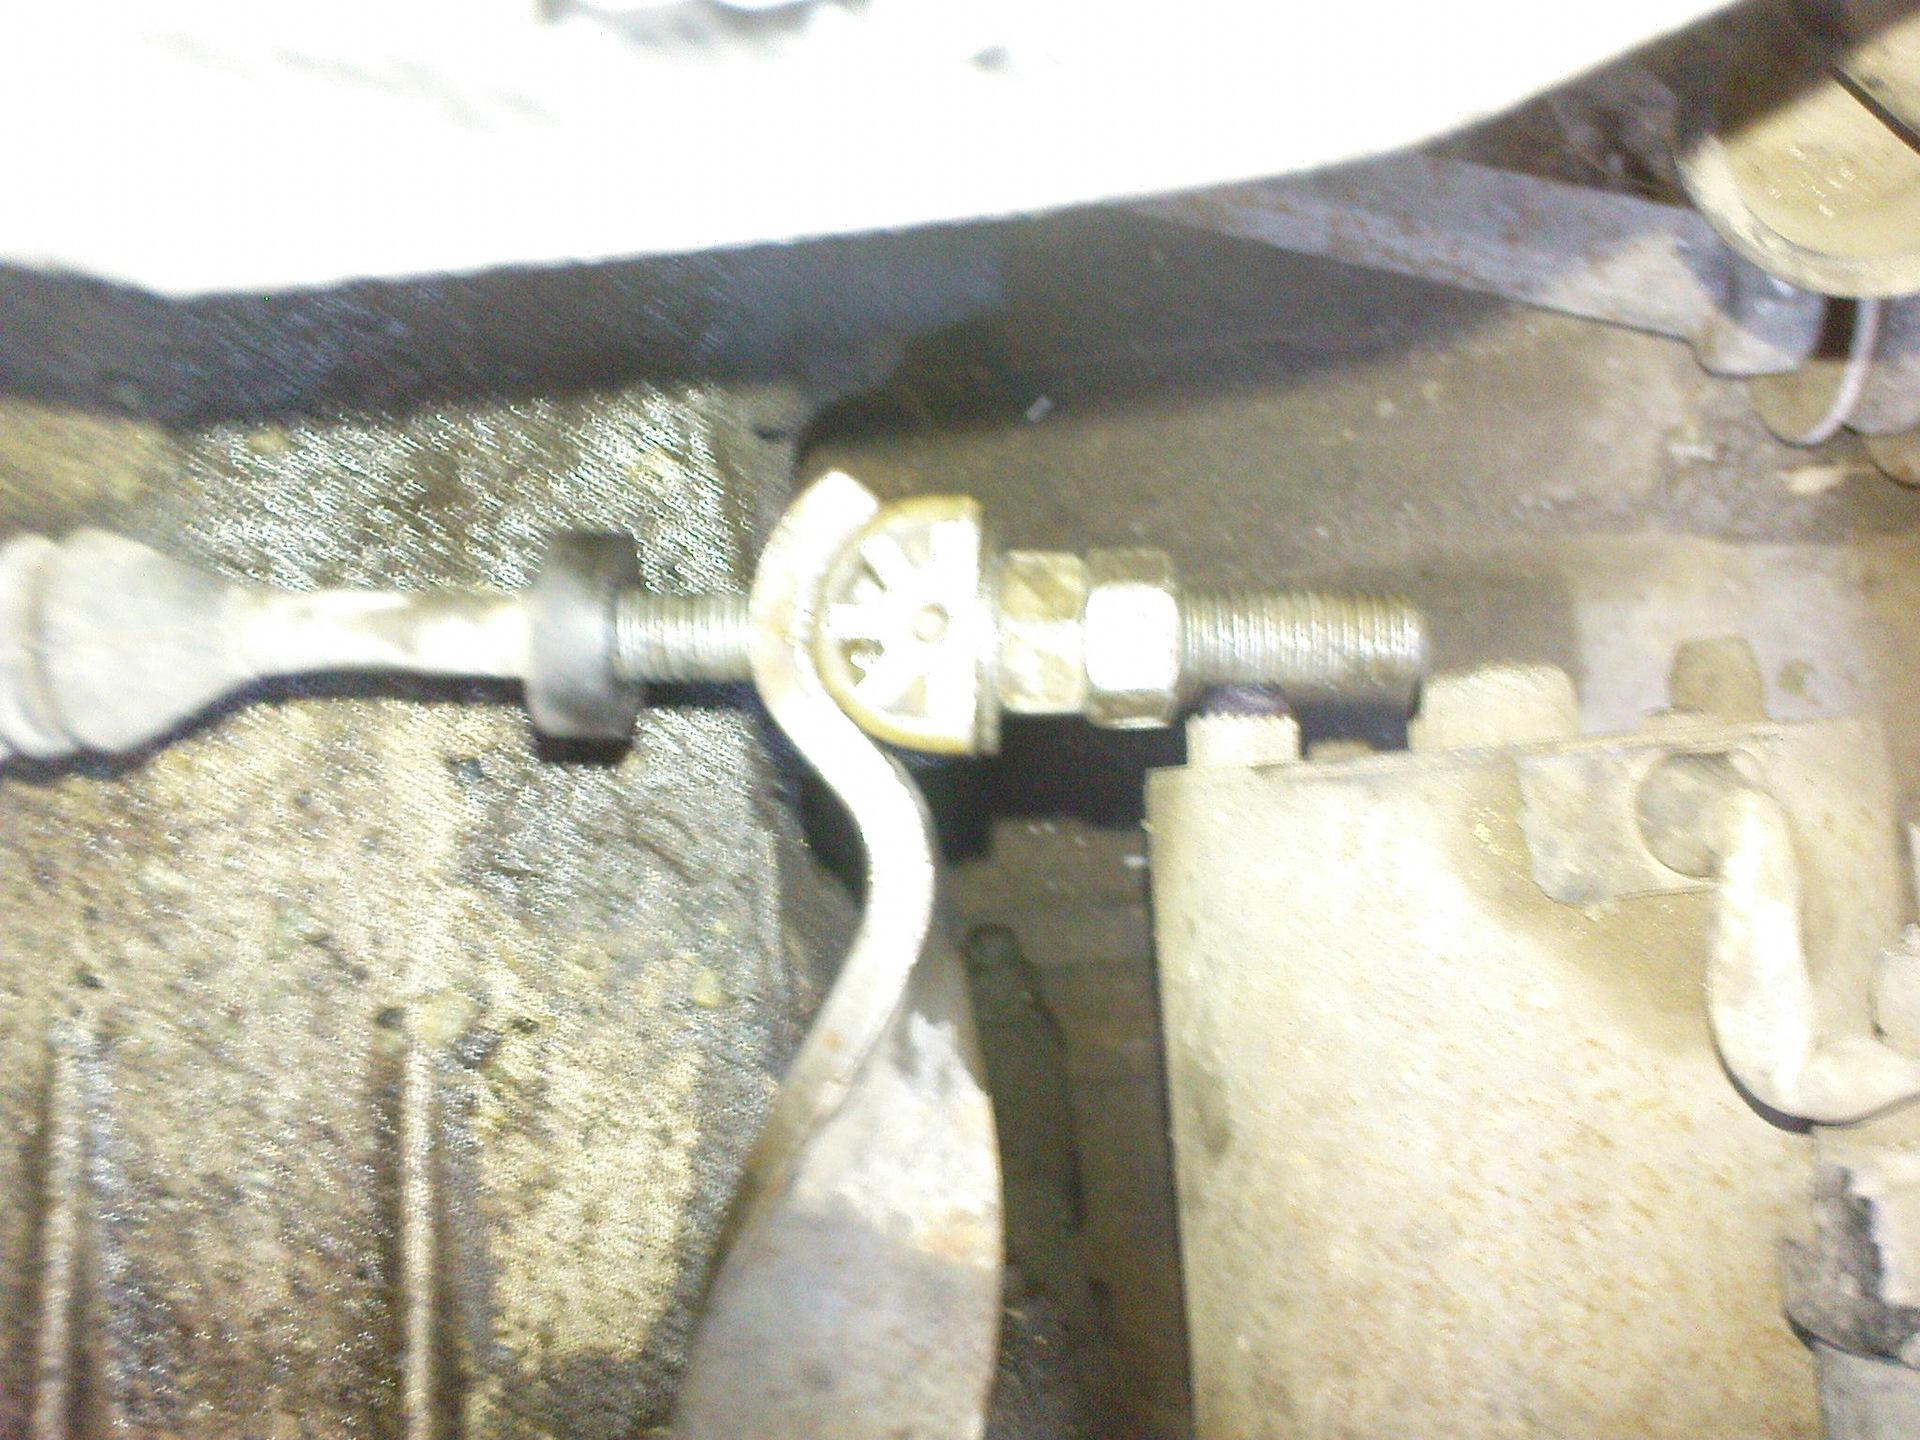 Фото №44 - провалилась педаль сцепления ВАЗ 2110